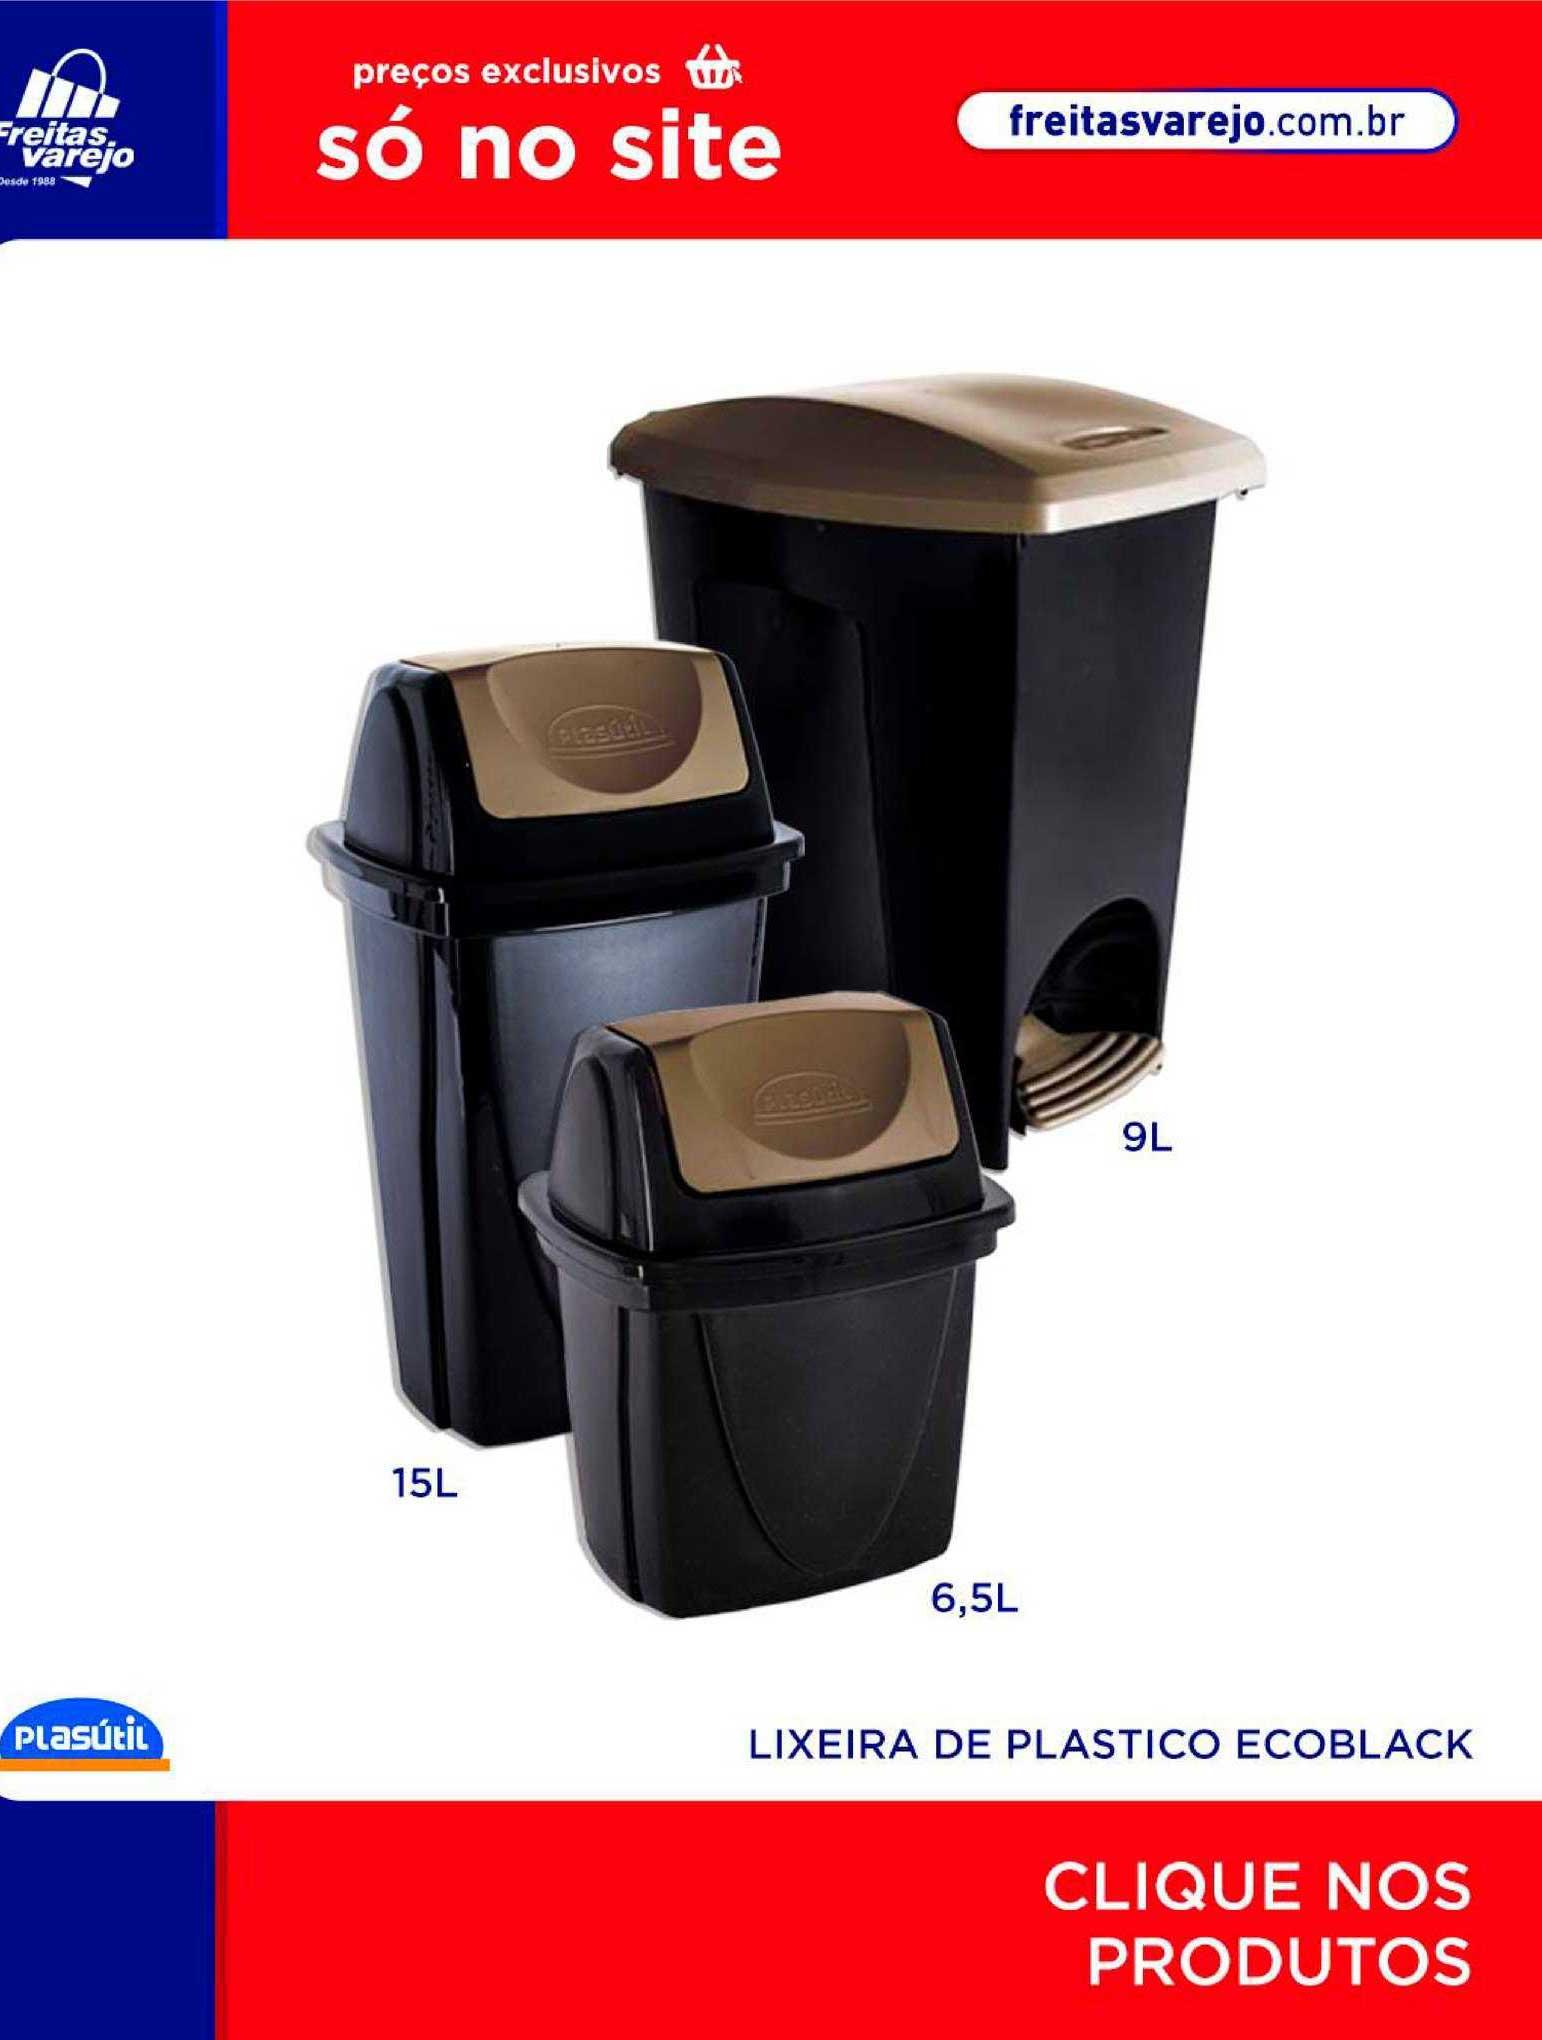 Freitas Varejo Lixeira De Plastico Ecoblack